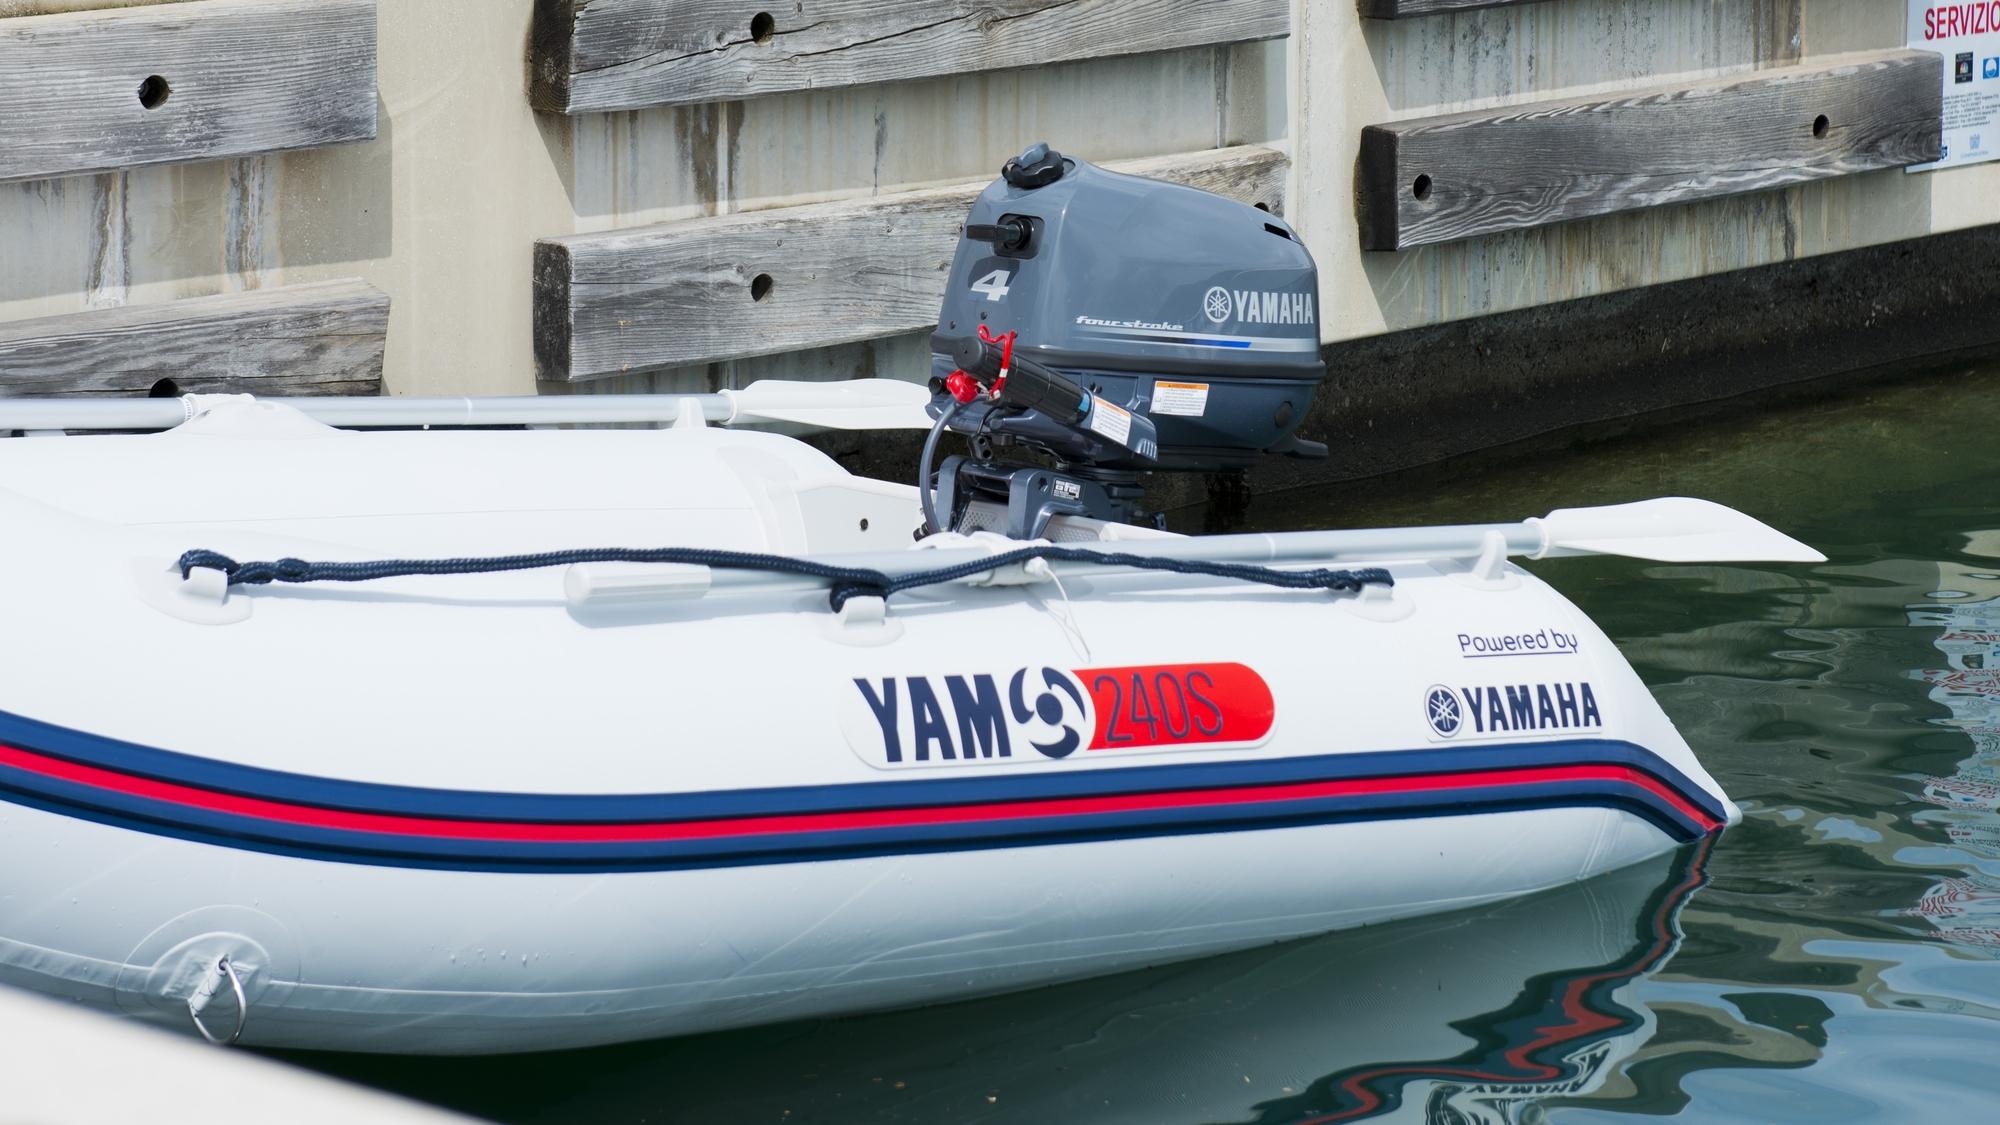 yamaha marine fuoribordo 4 - 5 - 6 cavalli venezia (2)